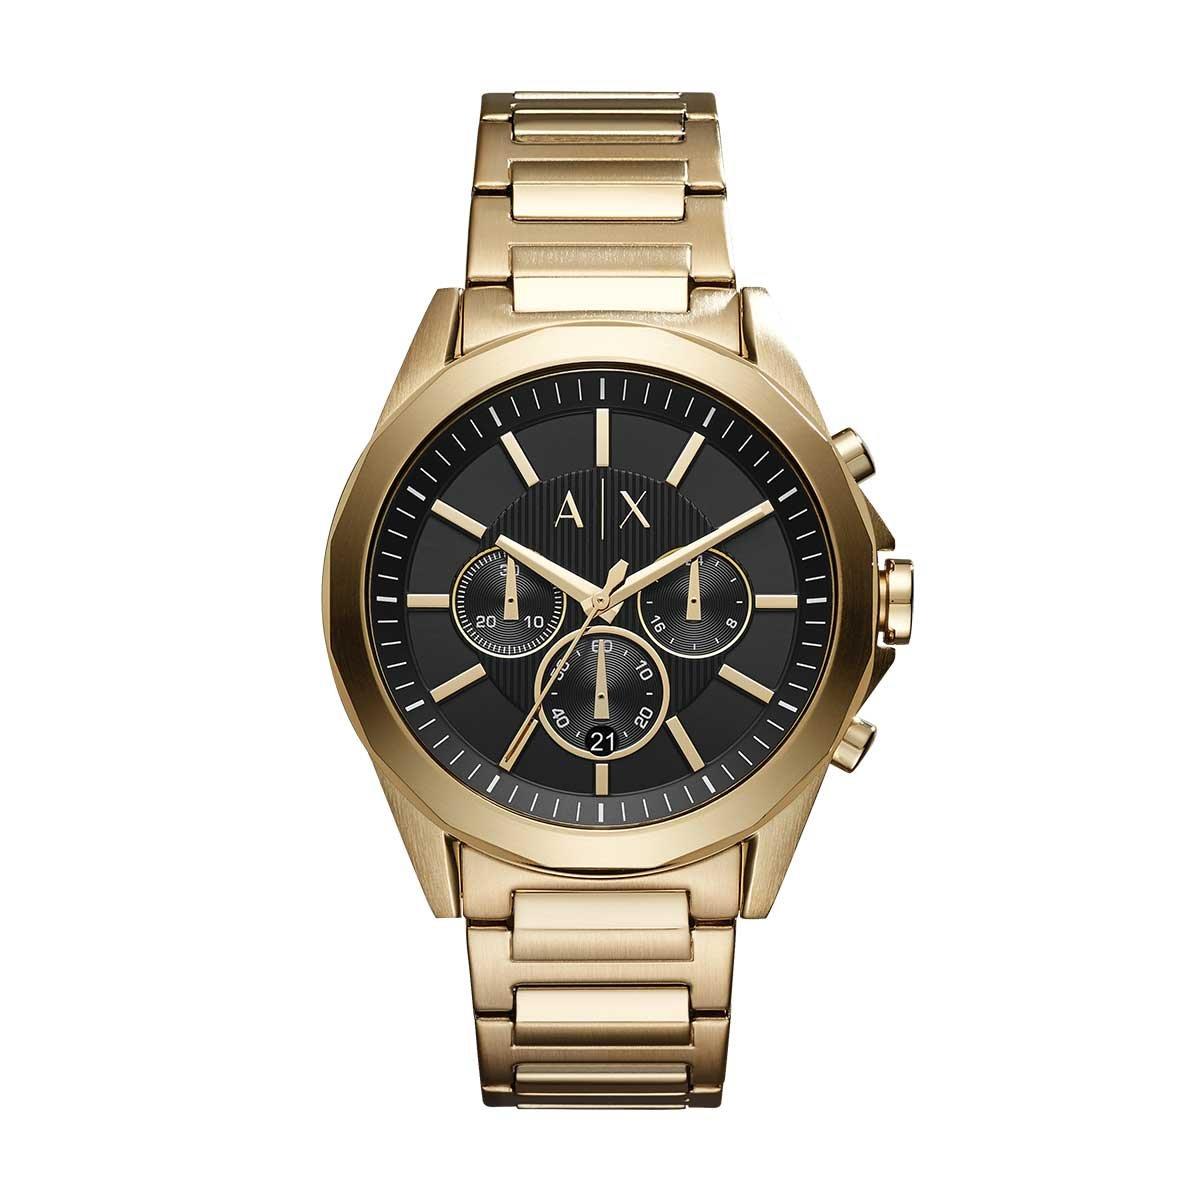 b4561c5bdee9 Reloj Caballero Armani Exchange AX2611